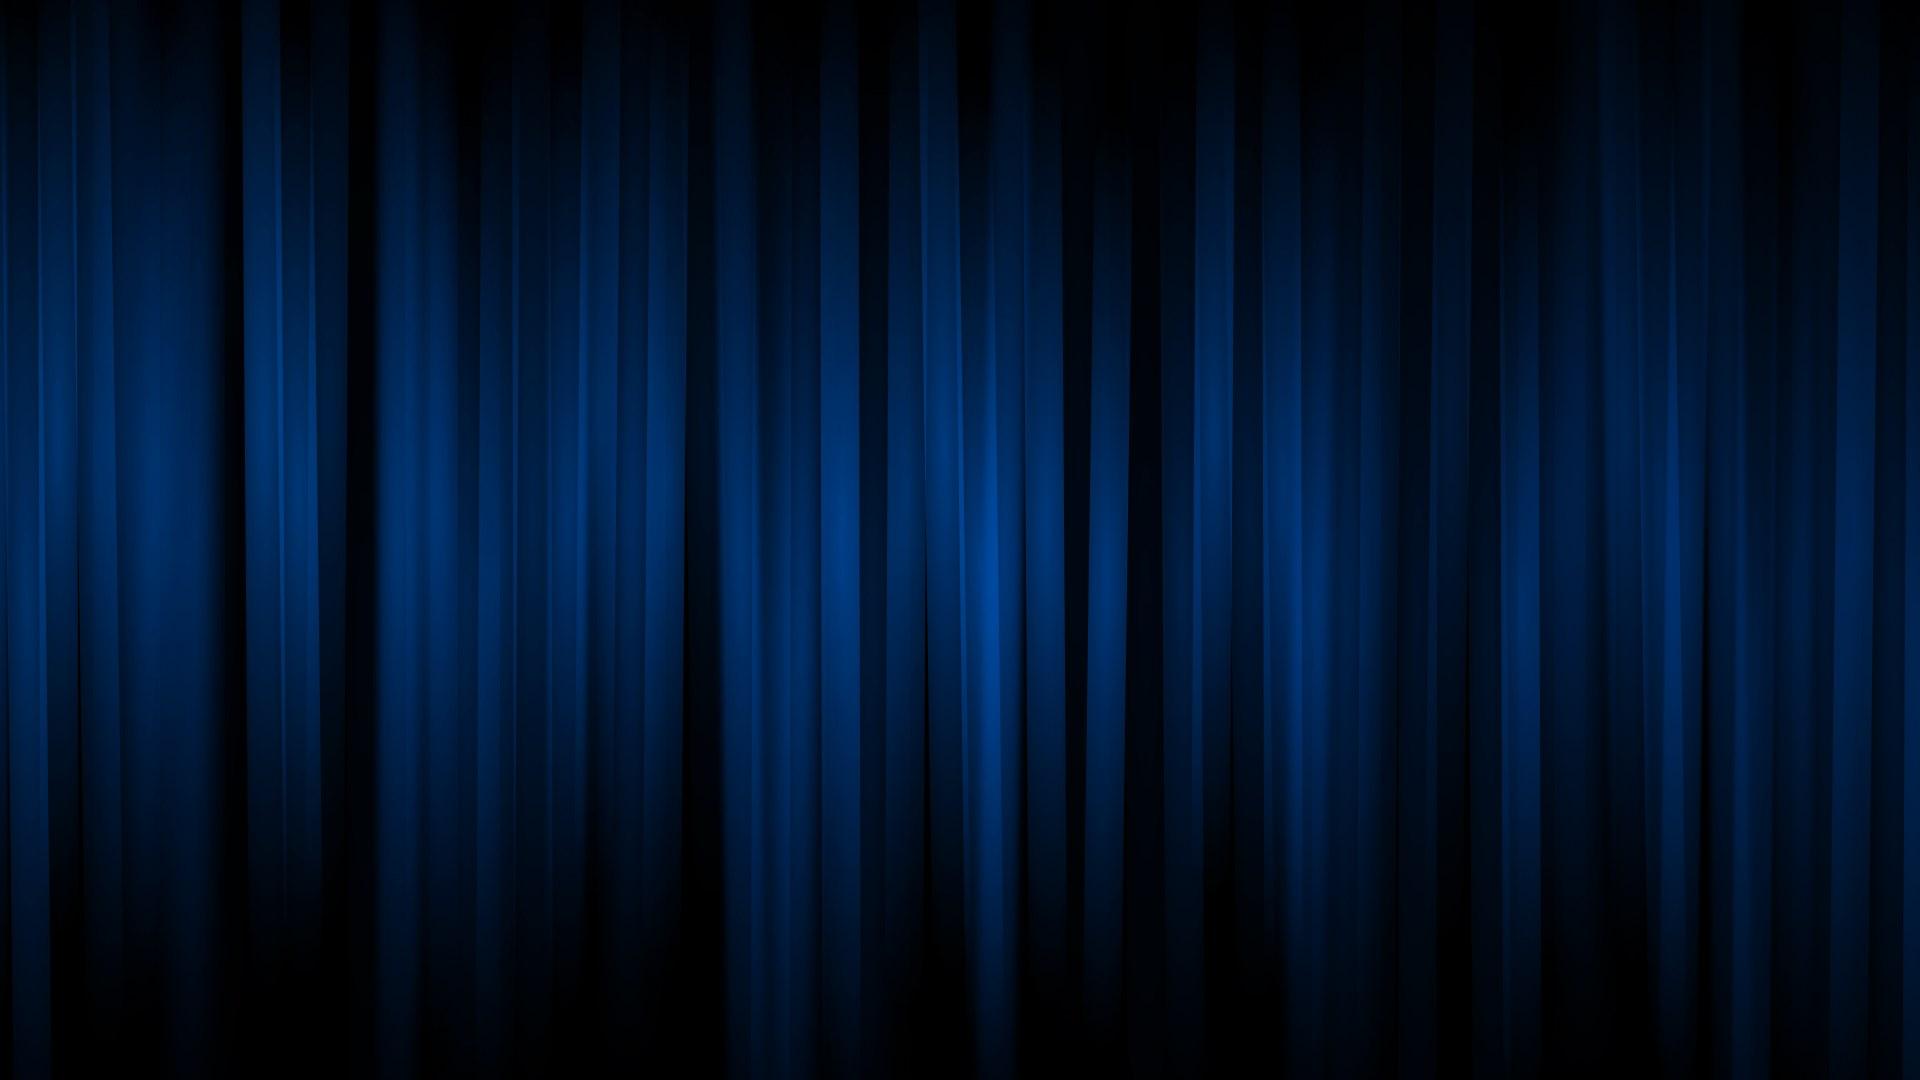 1920x1080-free-screensaver-for-blue-wallpaper-wpc900742